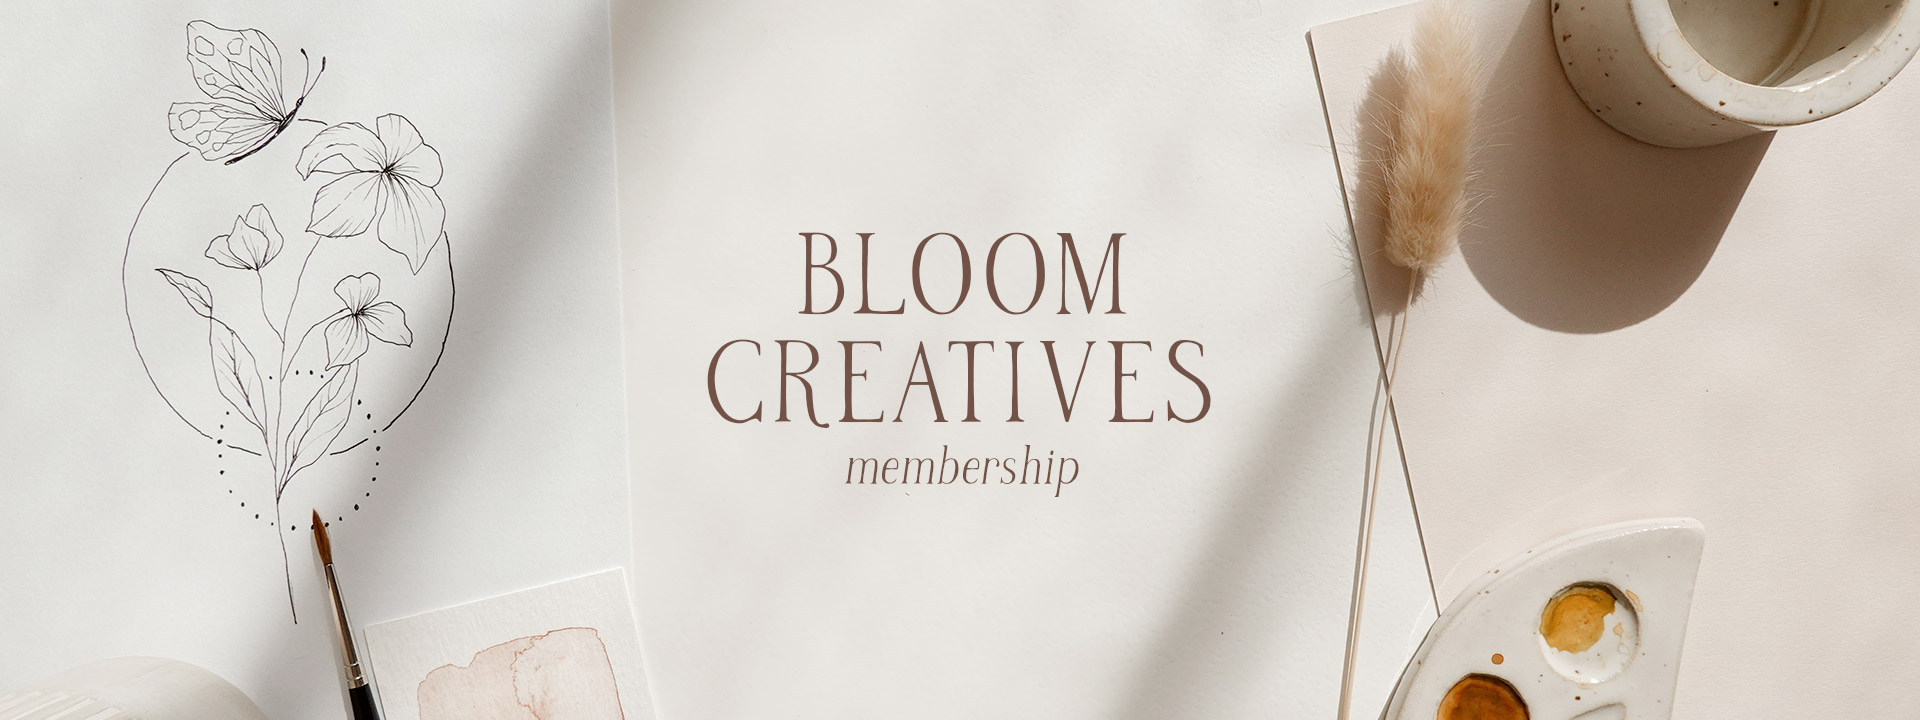 Bloom Creatives Membership - Art classes for all Creatives